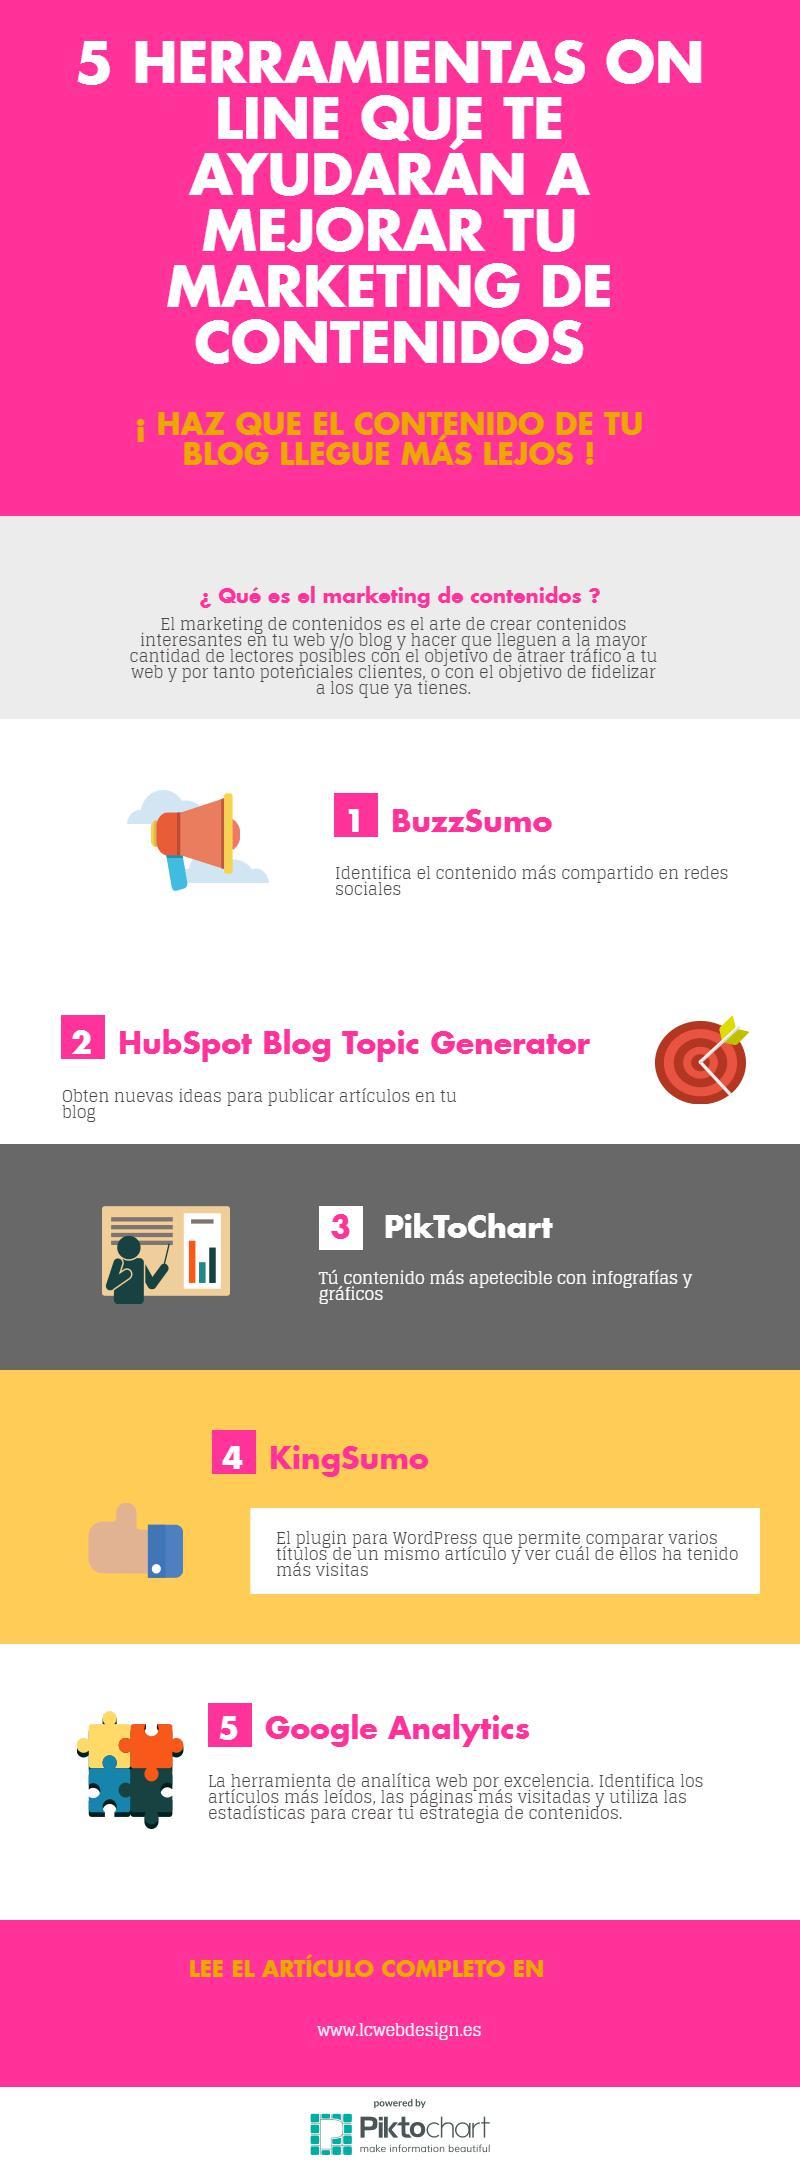 infografia-5-herramientas-mejorar-marketing-contenidos